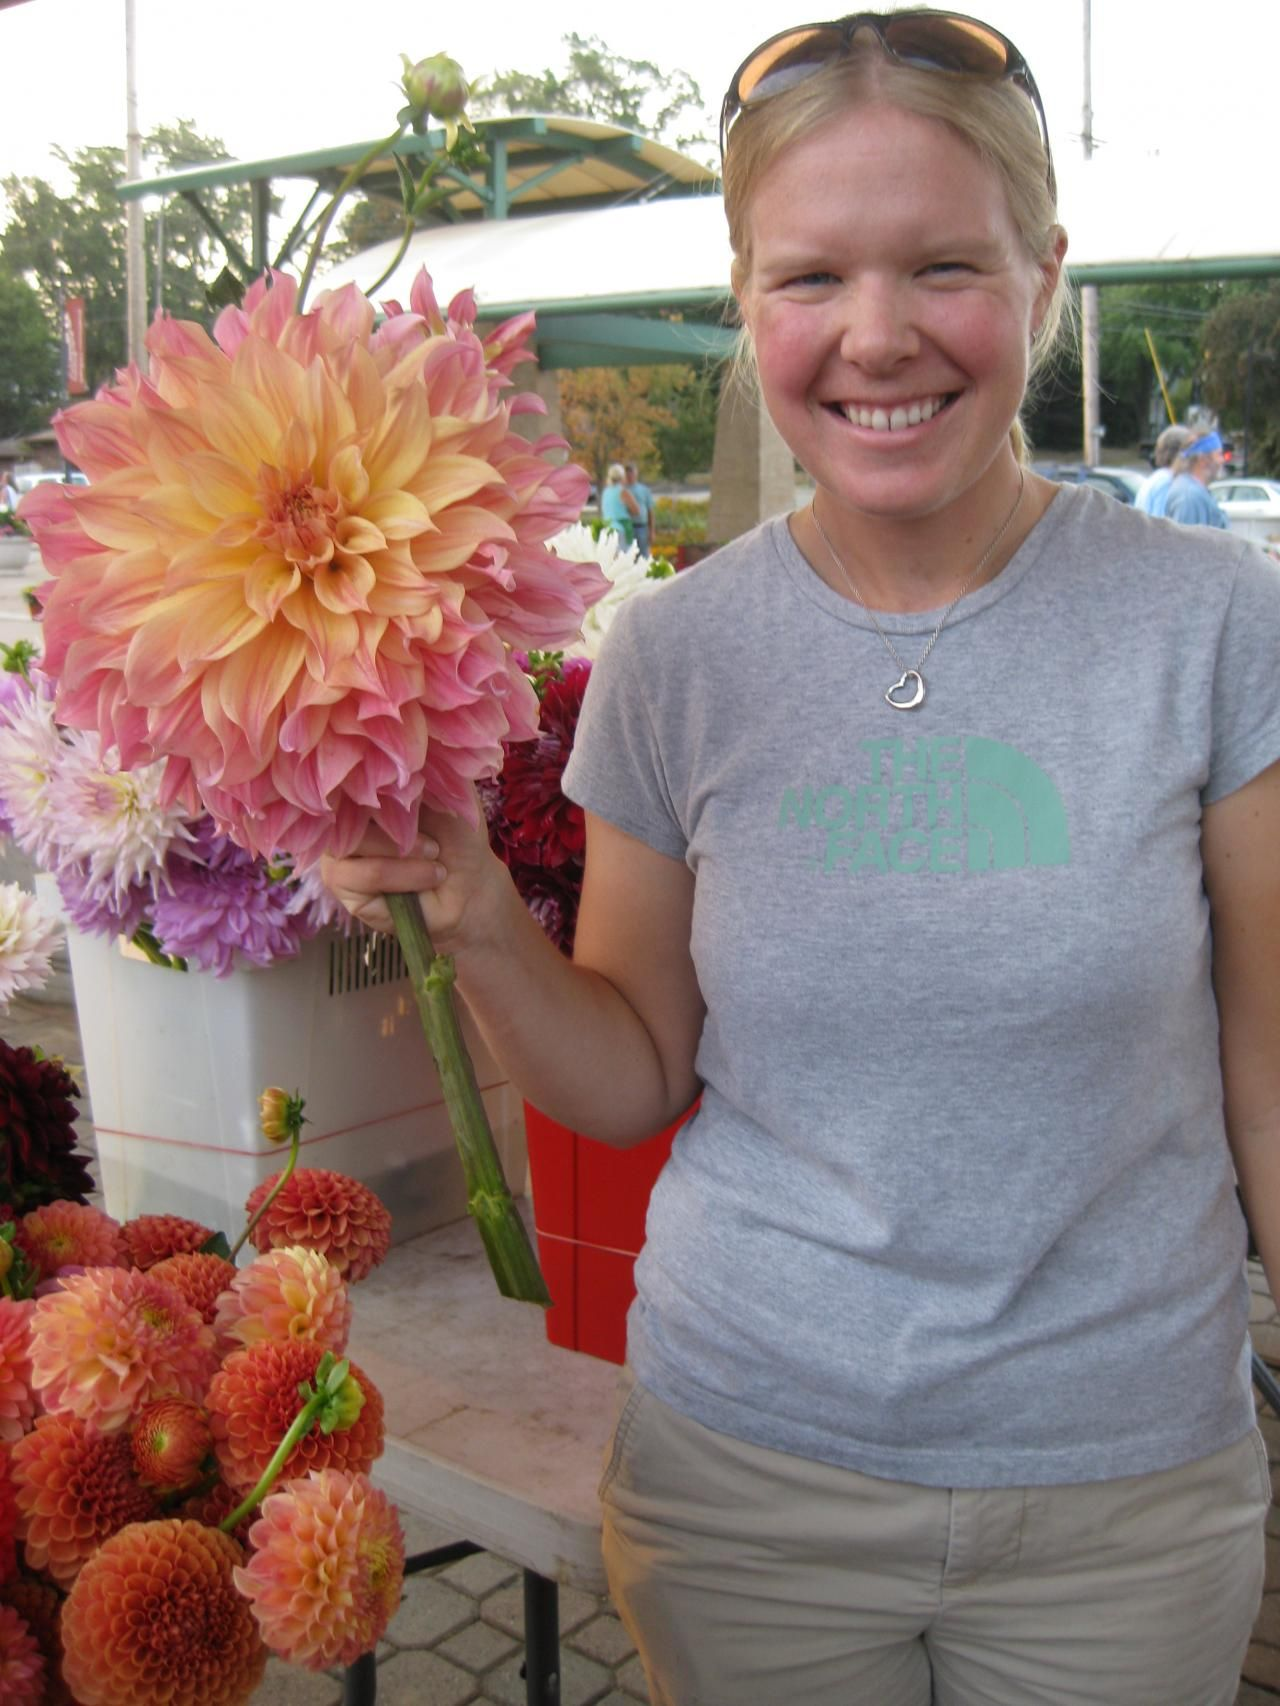 Farmers Markets Whimsical Wedding Flowers Floral Arrangements Wedding Dahlia